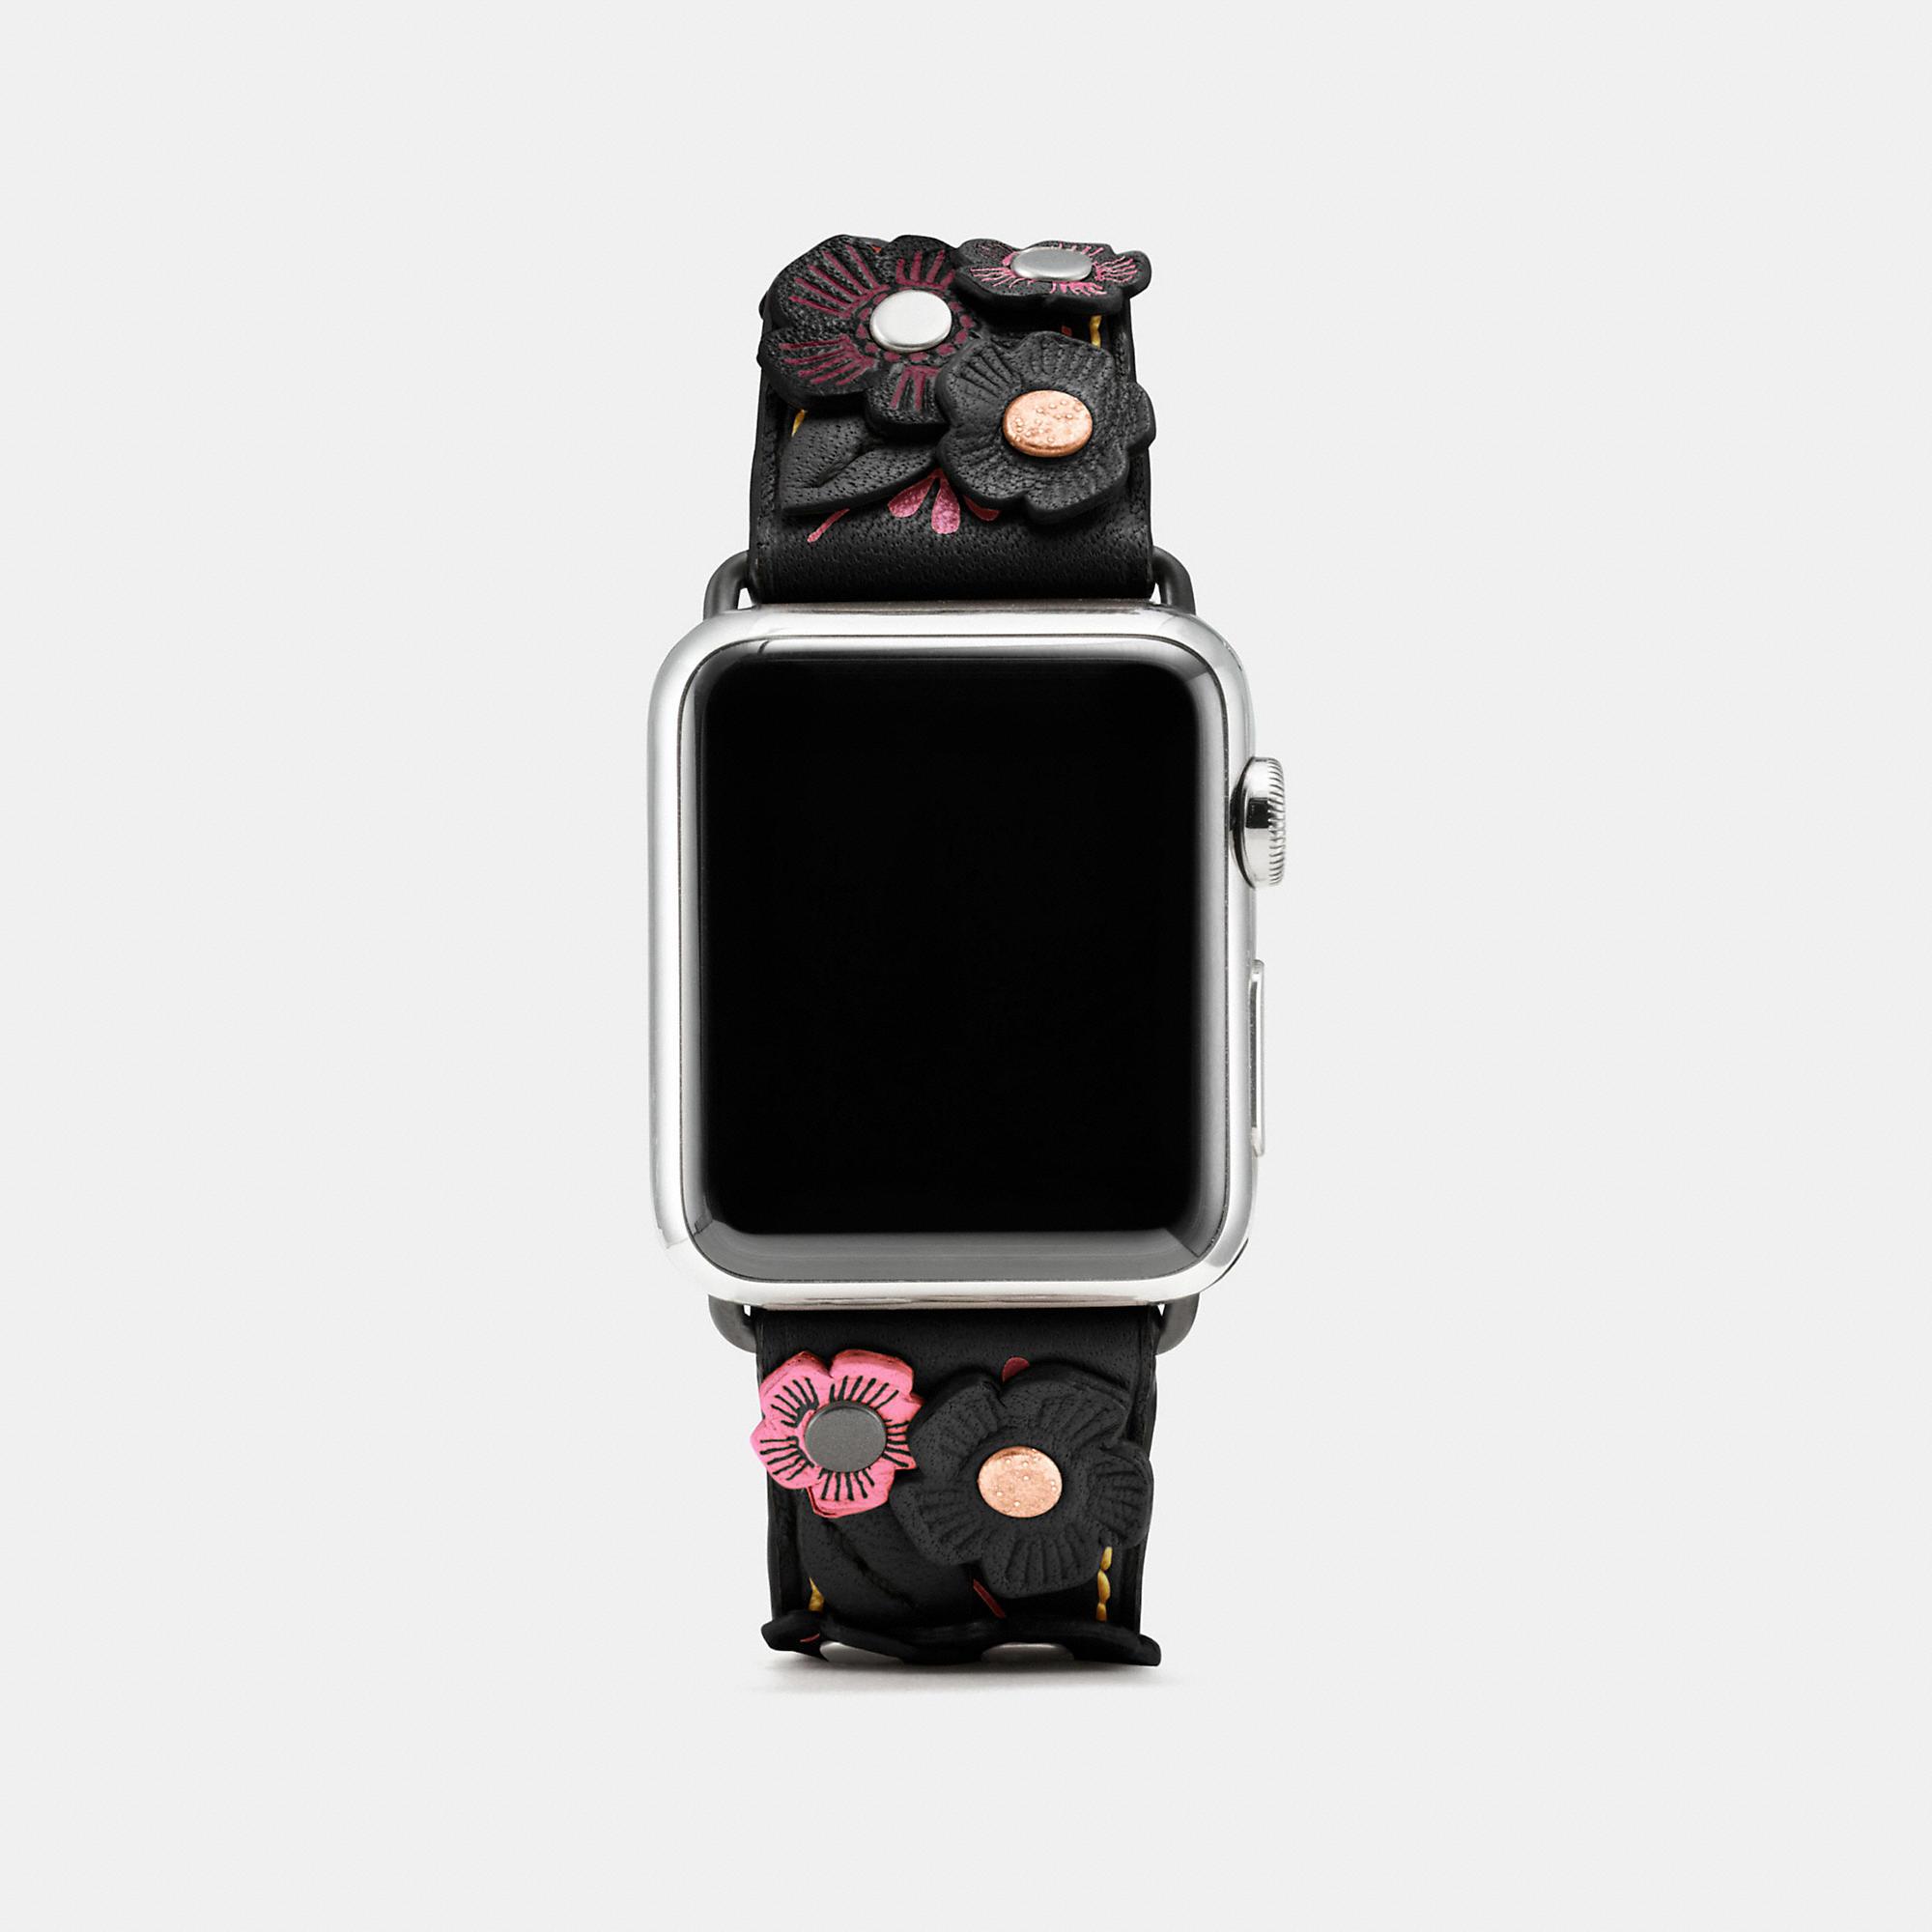 Coach Apple Watch Tea Rose Applique Leather Strap